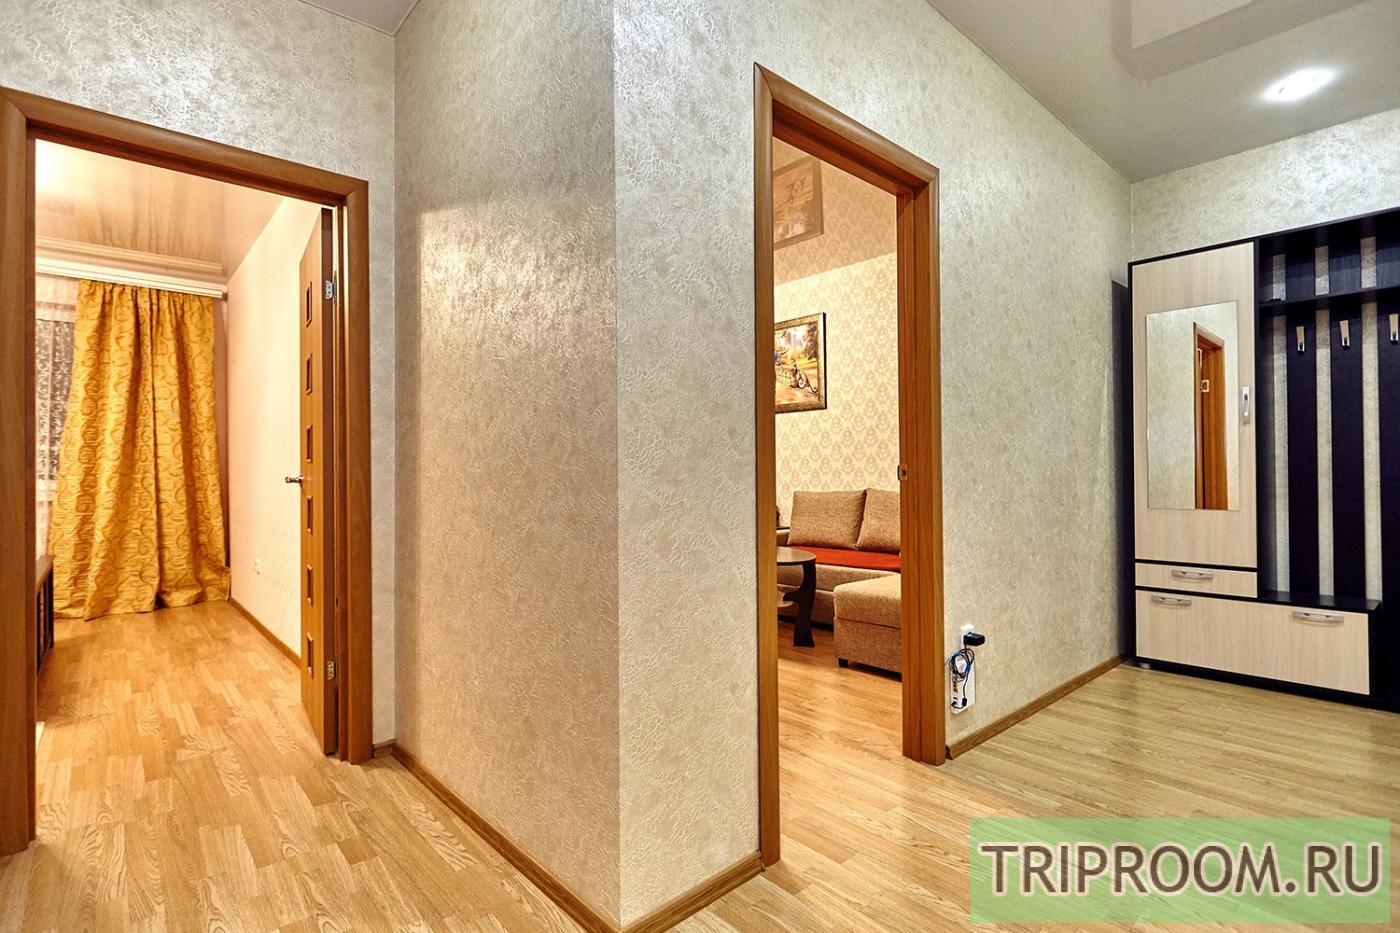 2-комнатная квартира посуточно (вариант № 10581), ул. Соколова улица, фото № 10